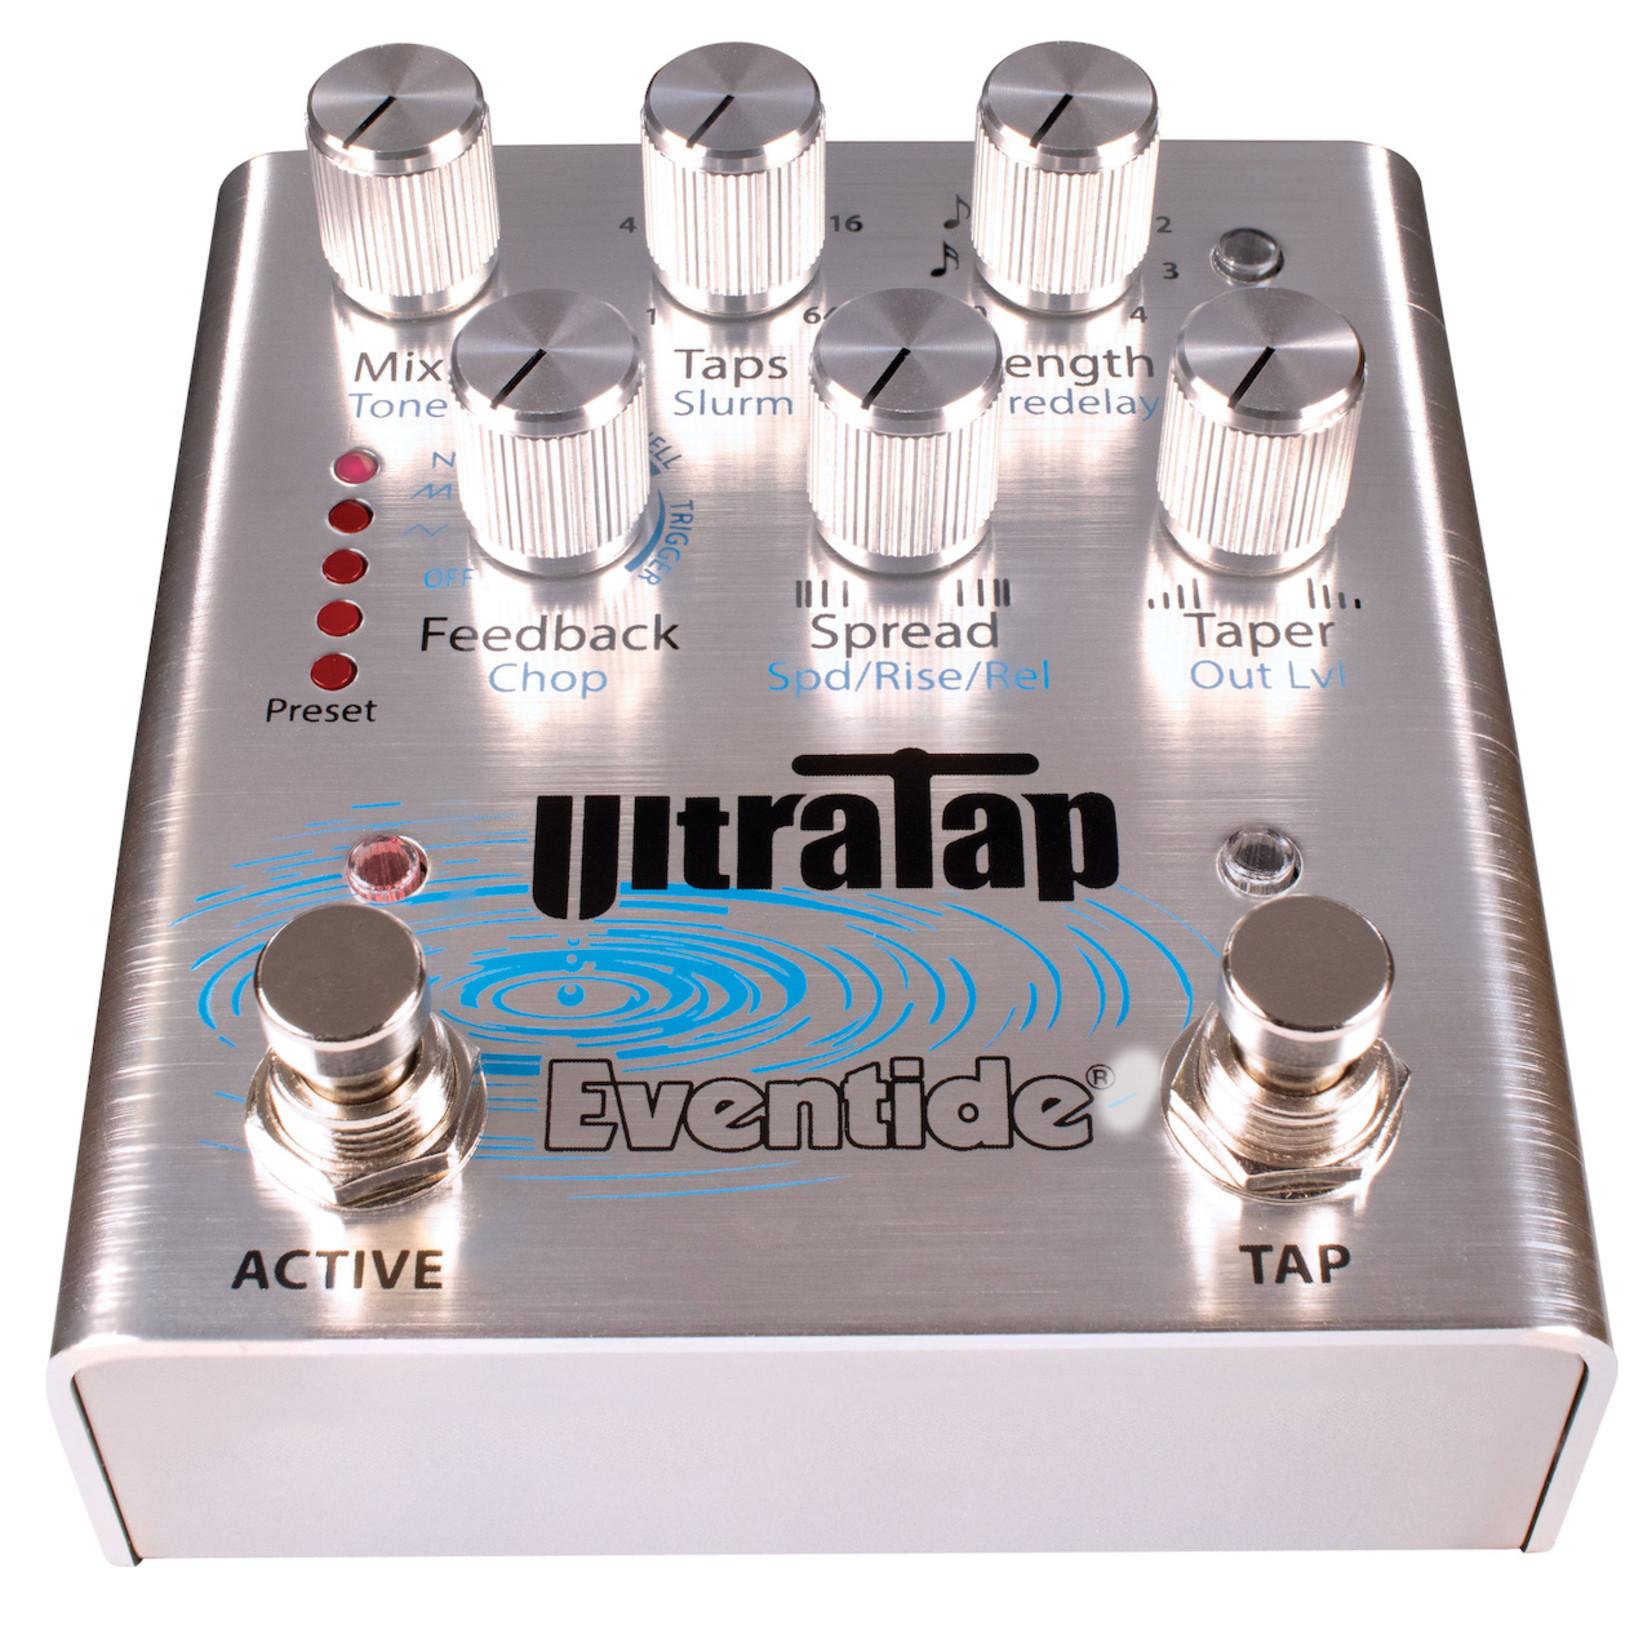 Eventide Eventide UltraTap Pedal - Rhythmic Delays, Glitchy Verbs, Volume Swells & Modulation